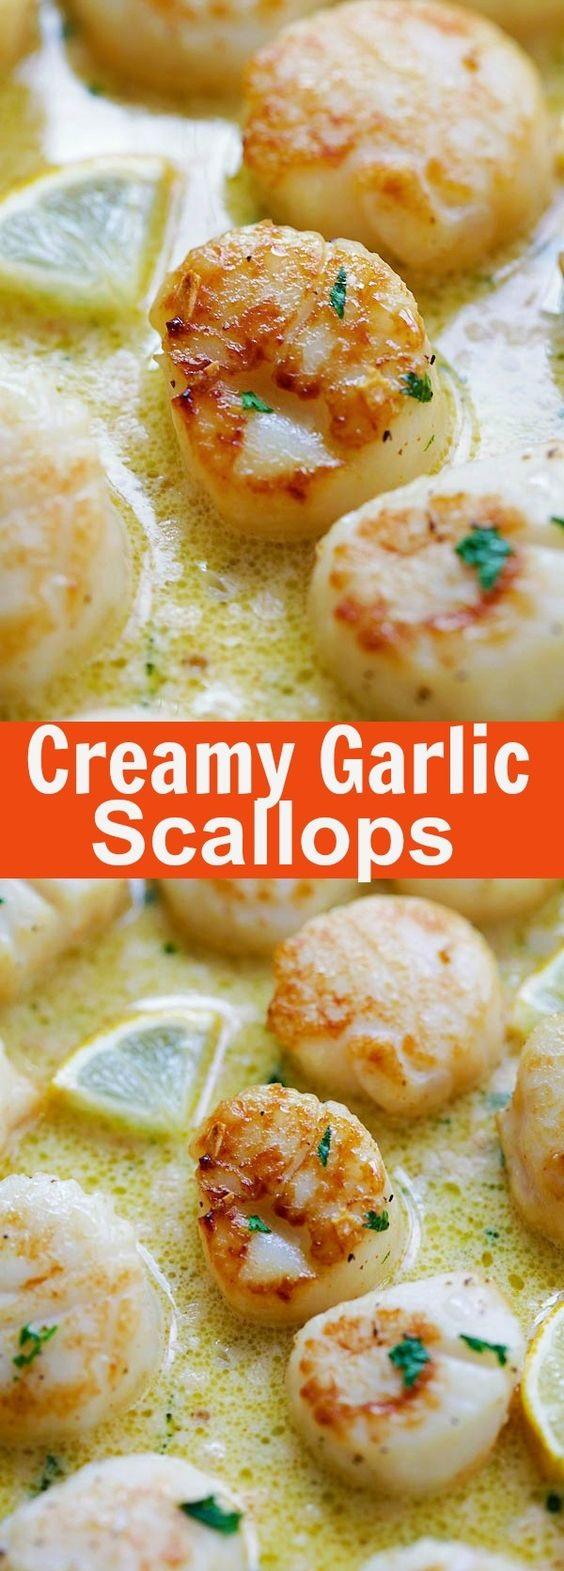 Creamy Garlic Scallops Recipe